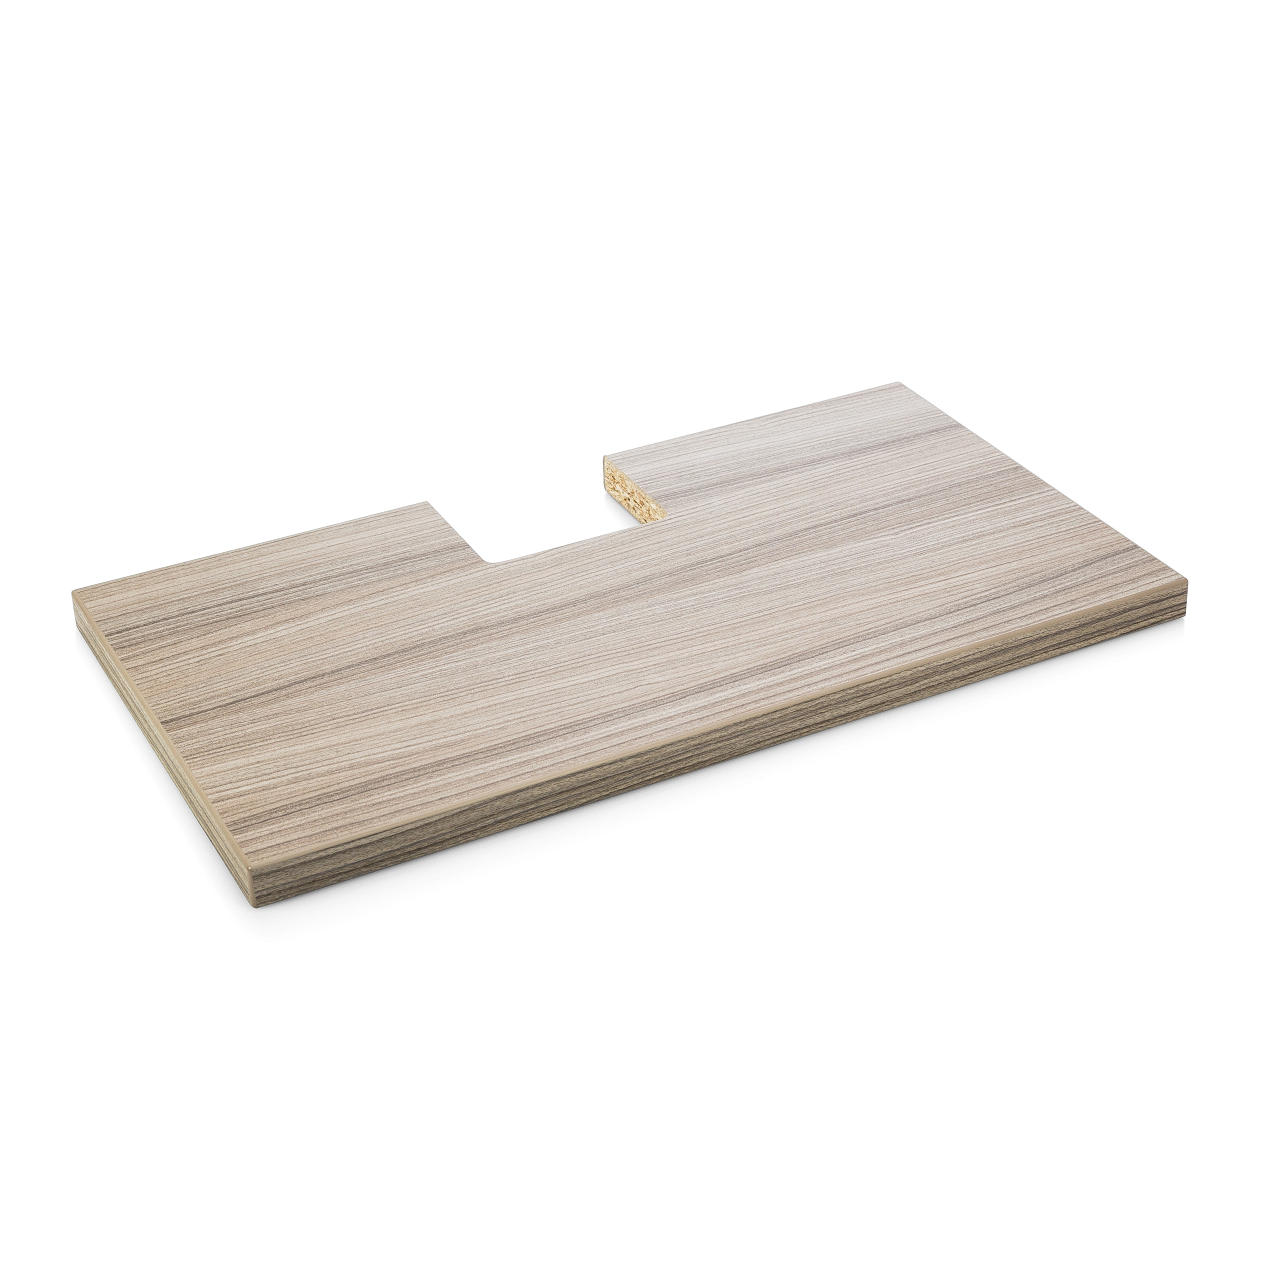 Regal-Set Holz Bodendisplay PB + BBC 5 Stk.